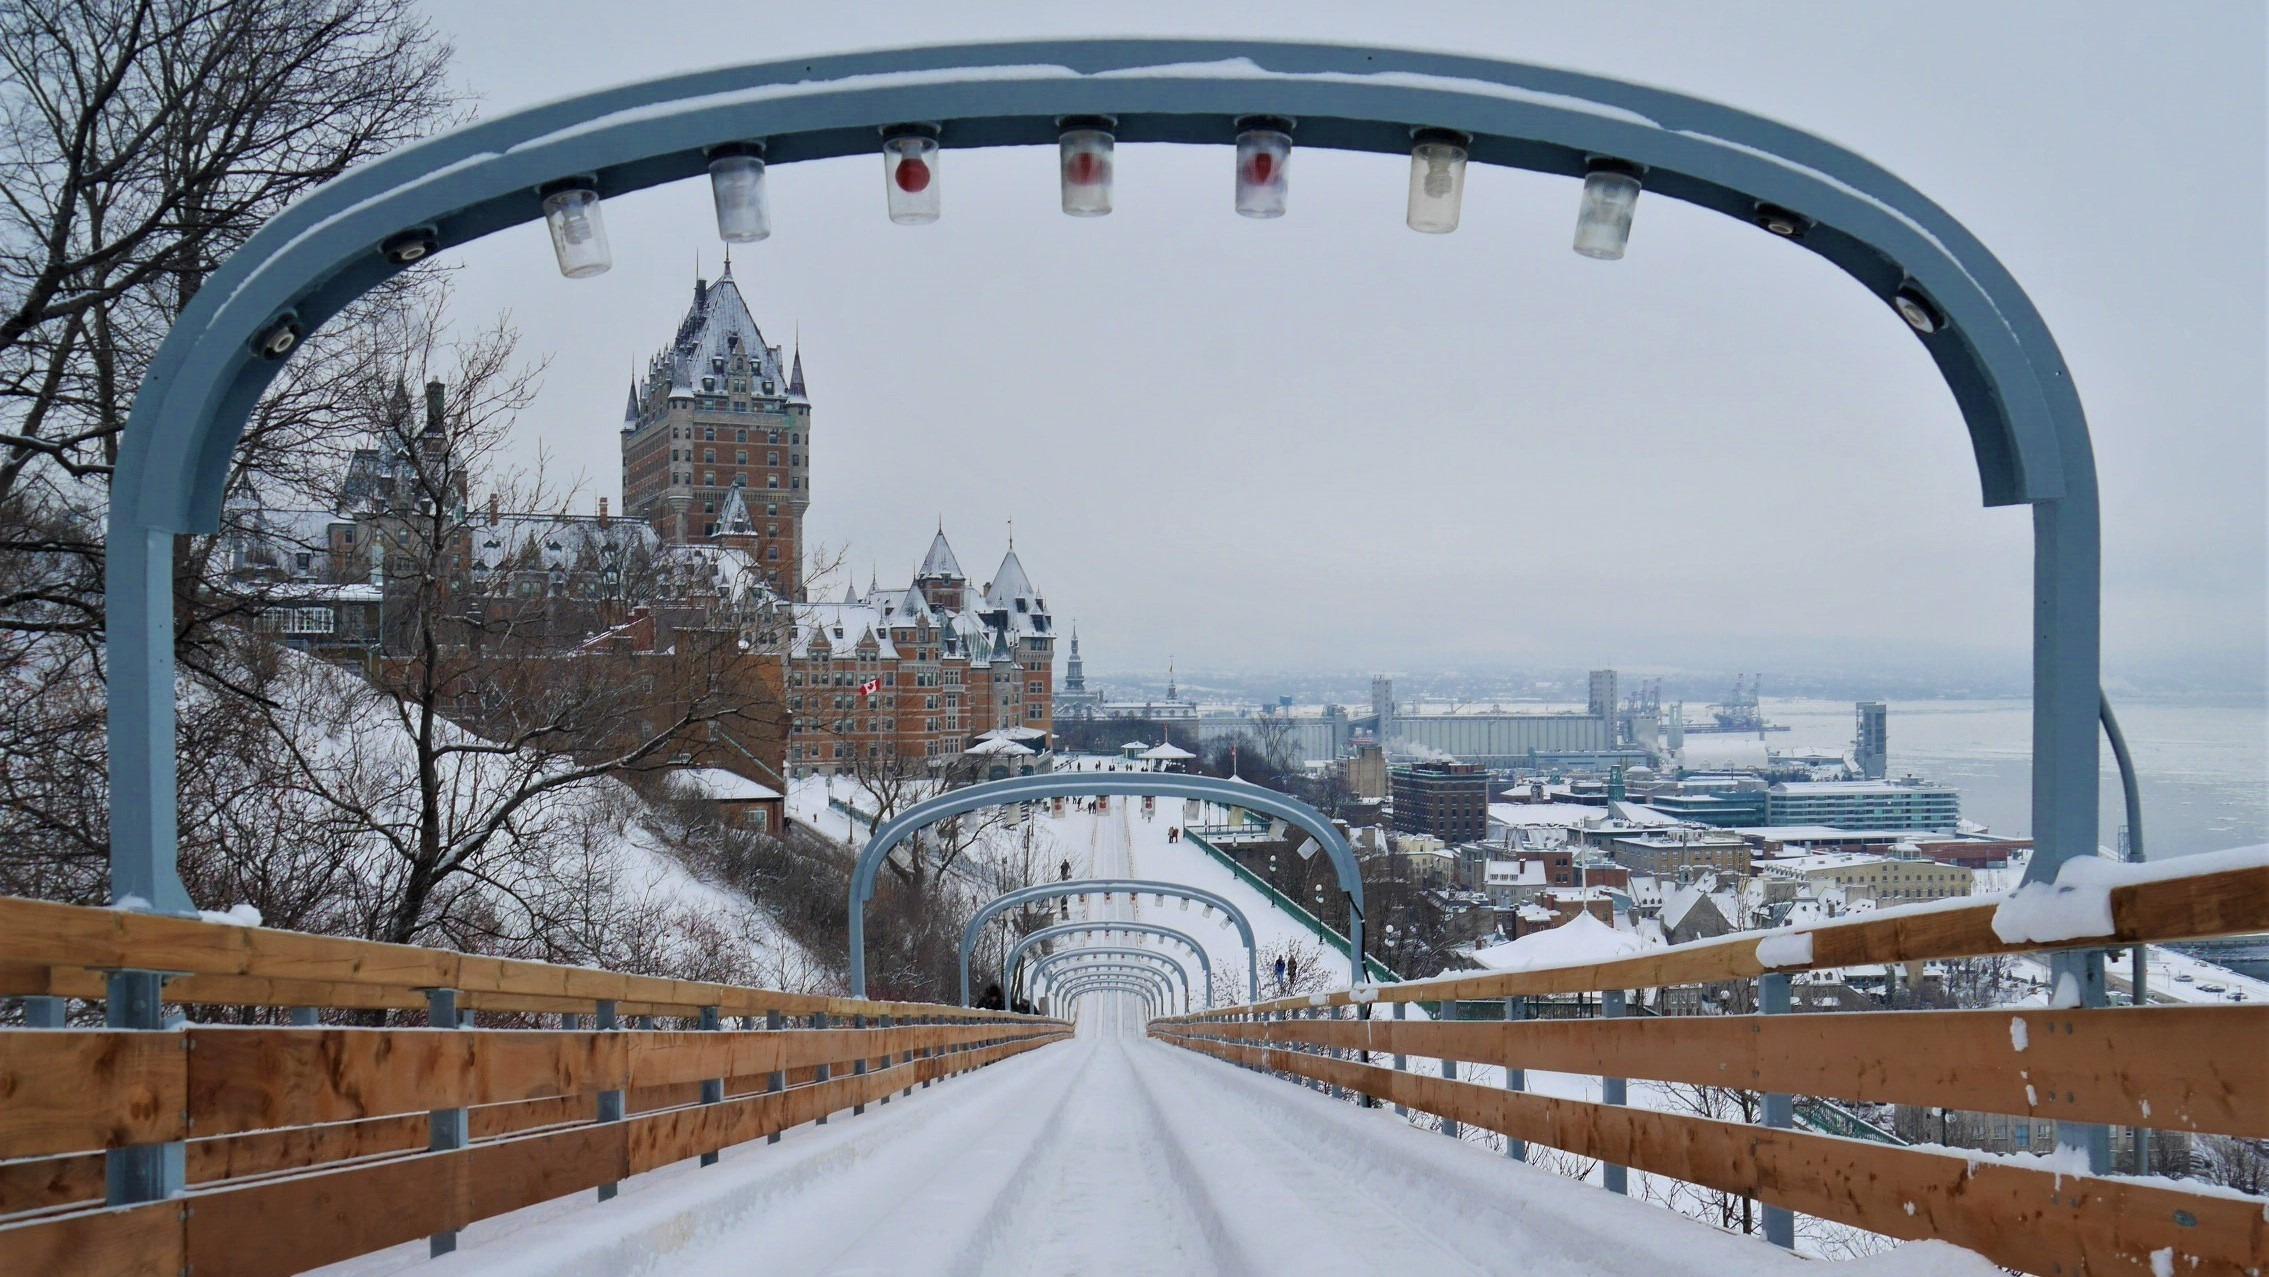 Quebec noel luge terrasse Dufferin infos pratiques blog voyage canada arpenter le chemin